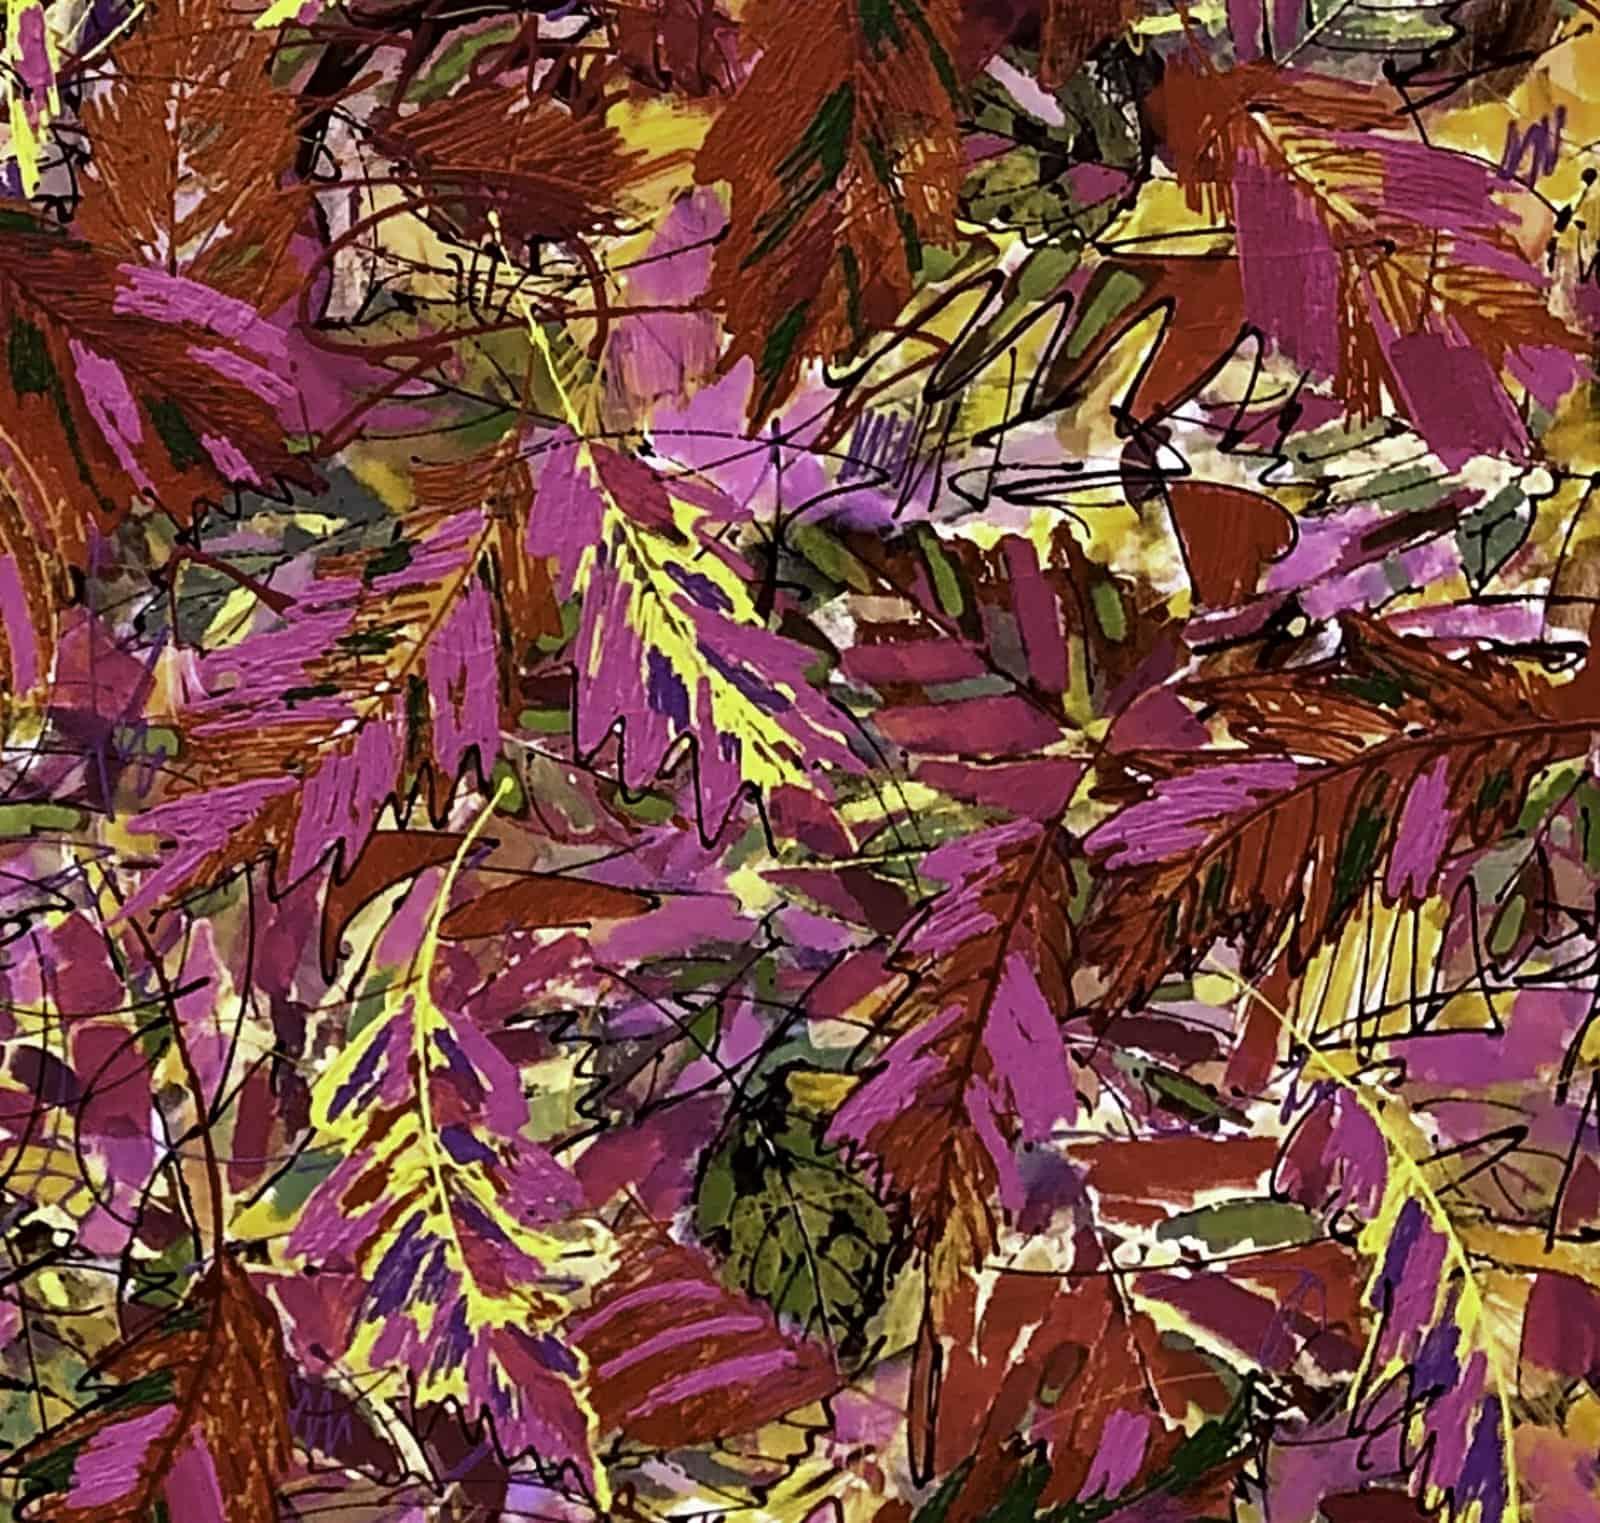 f7-2019-19_SOMSAK-CHAITUCH_Autumn-2019-5_200x200-acrylic-on-canvas_detail-1